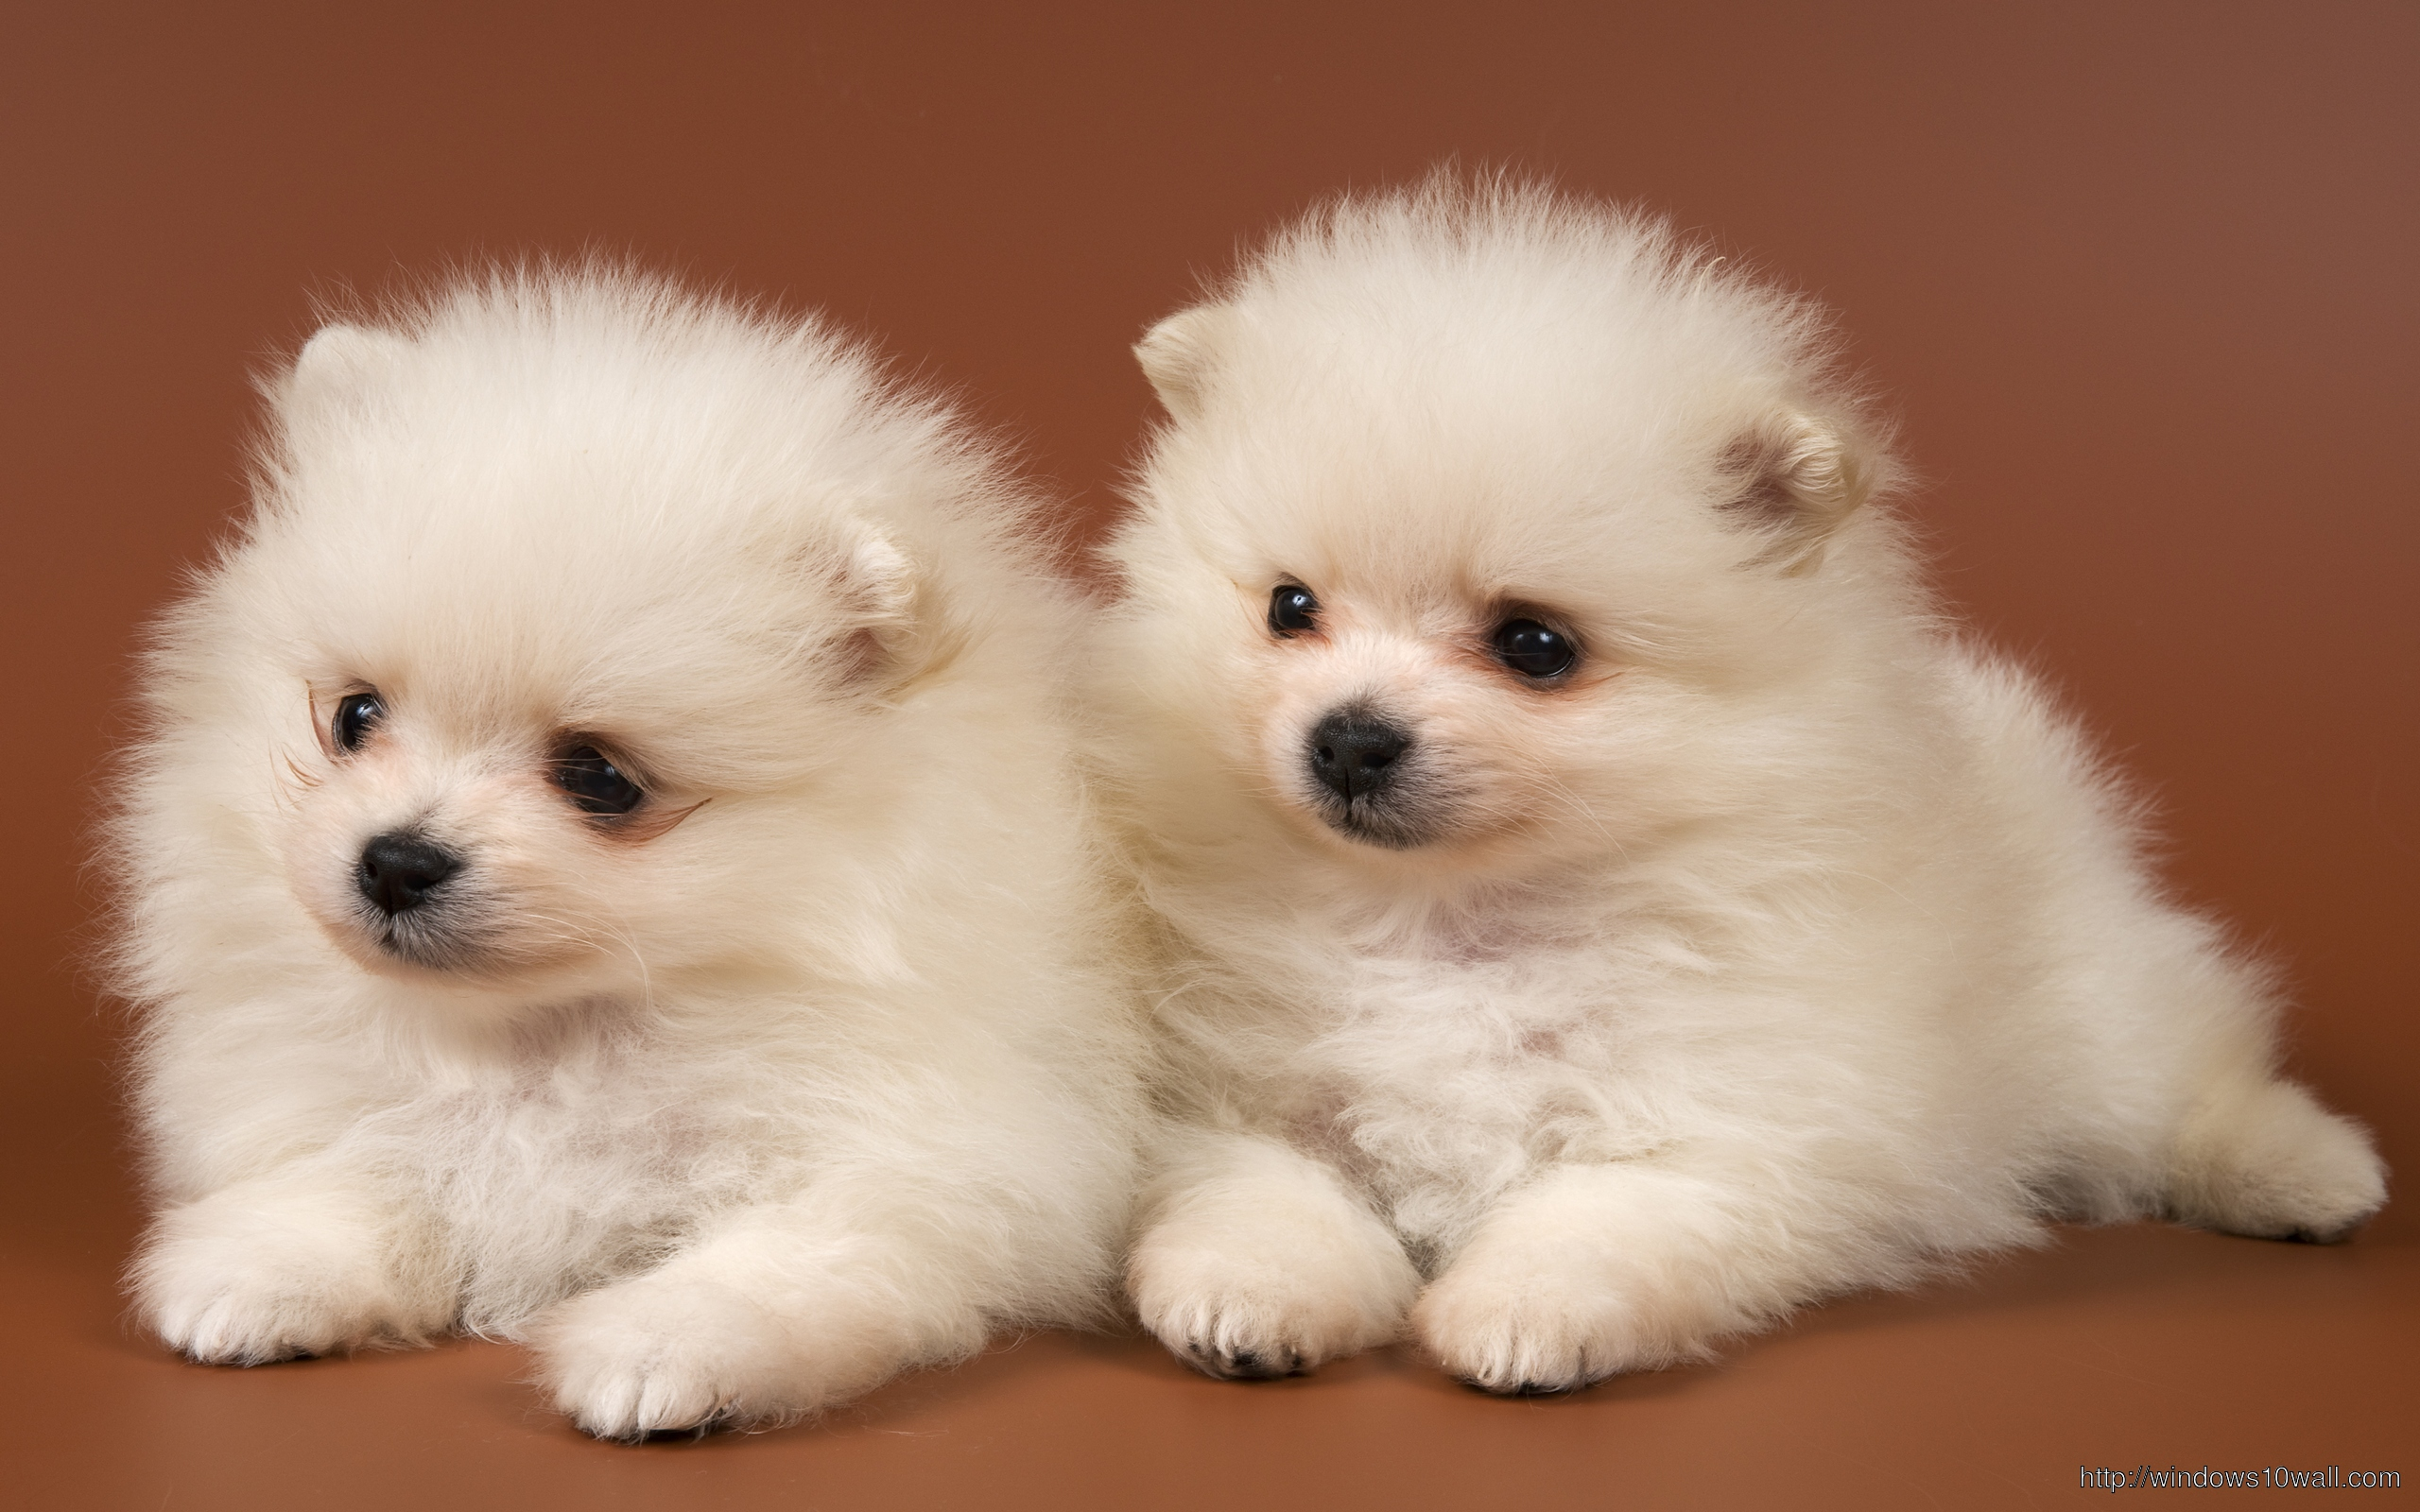 cute-baby-dogs-wallpaper